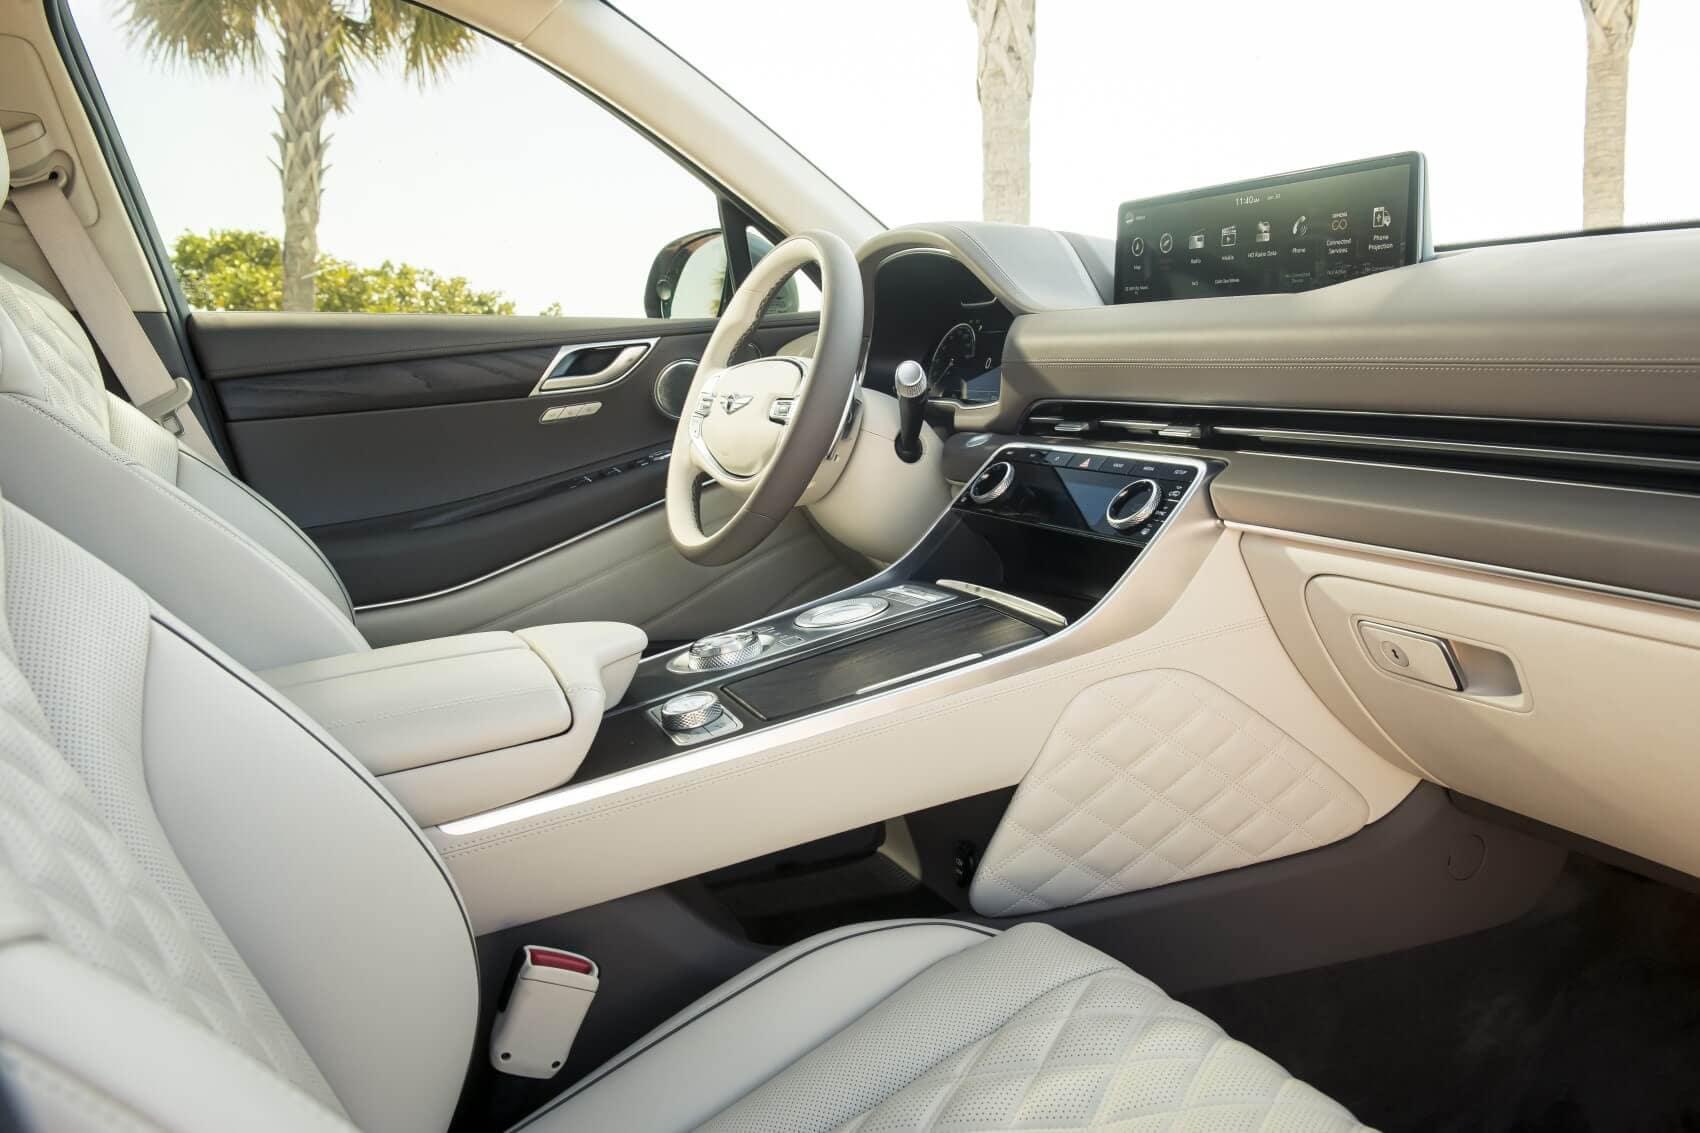 Genesis GV80 vs Range Rover Sport Interior